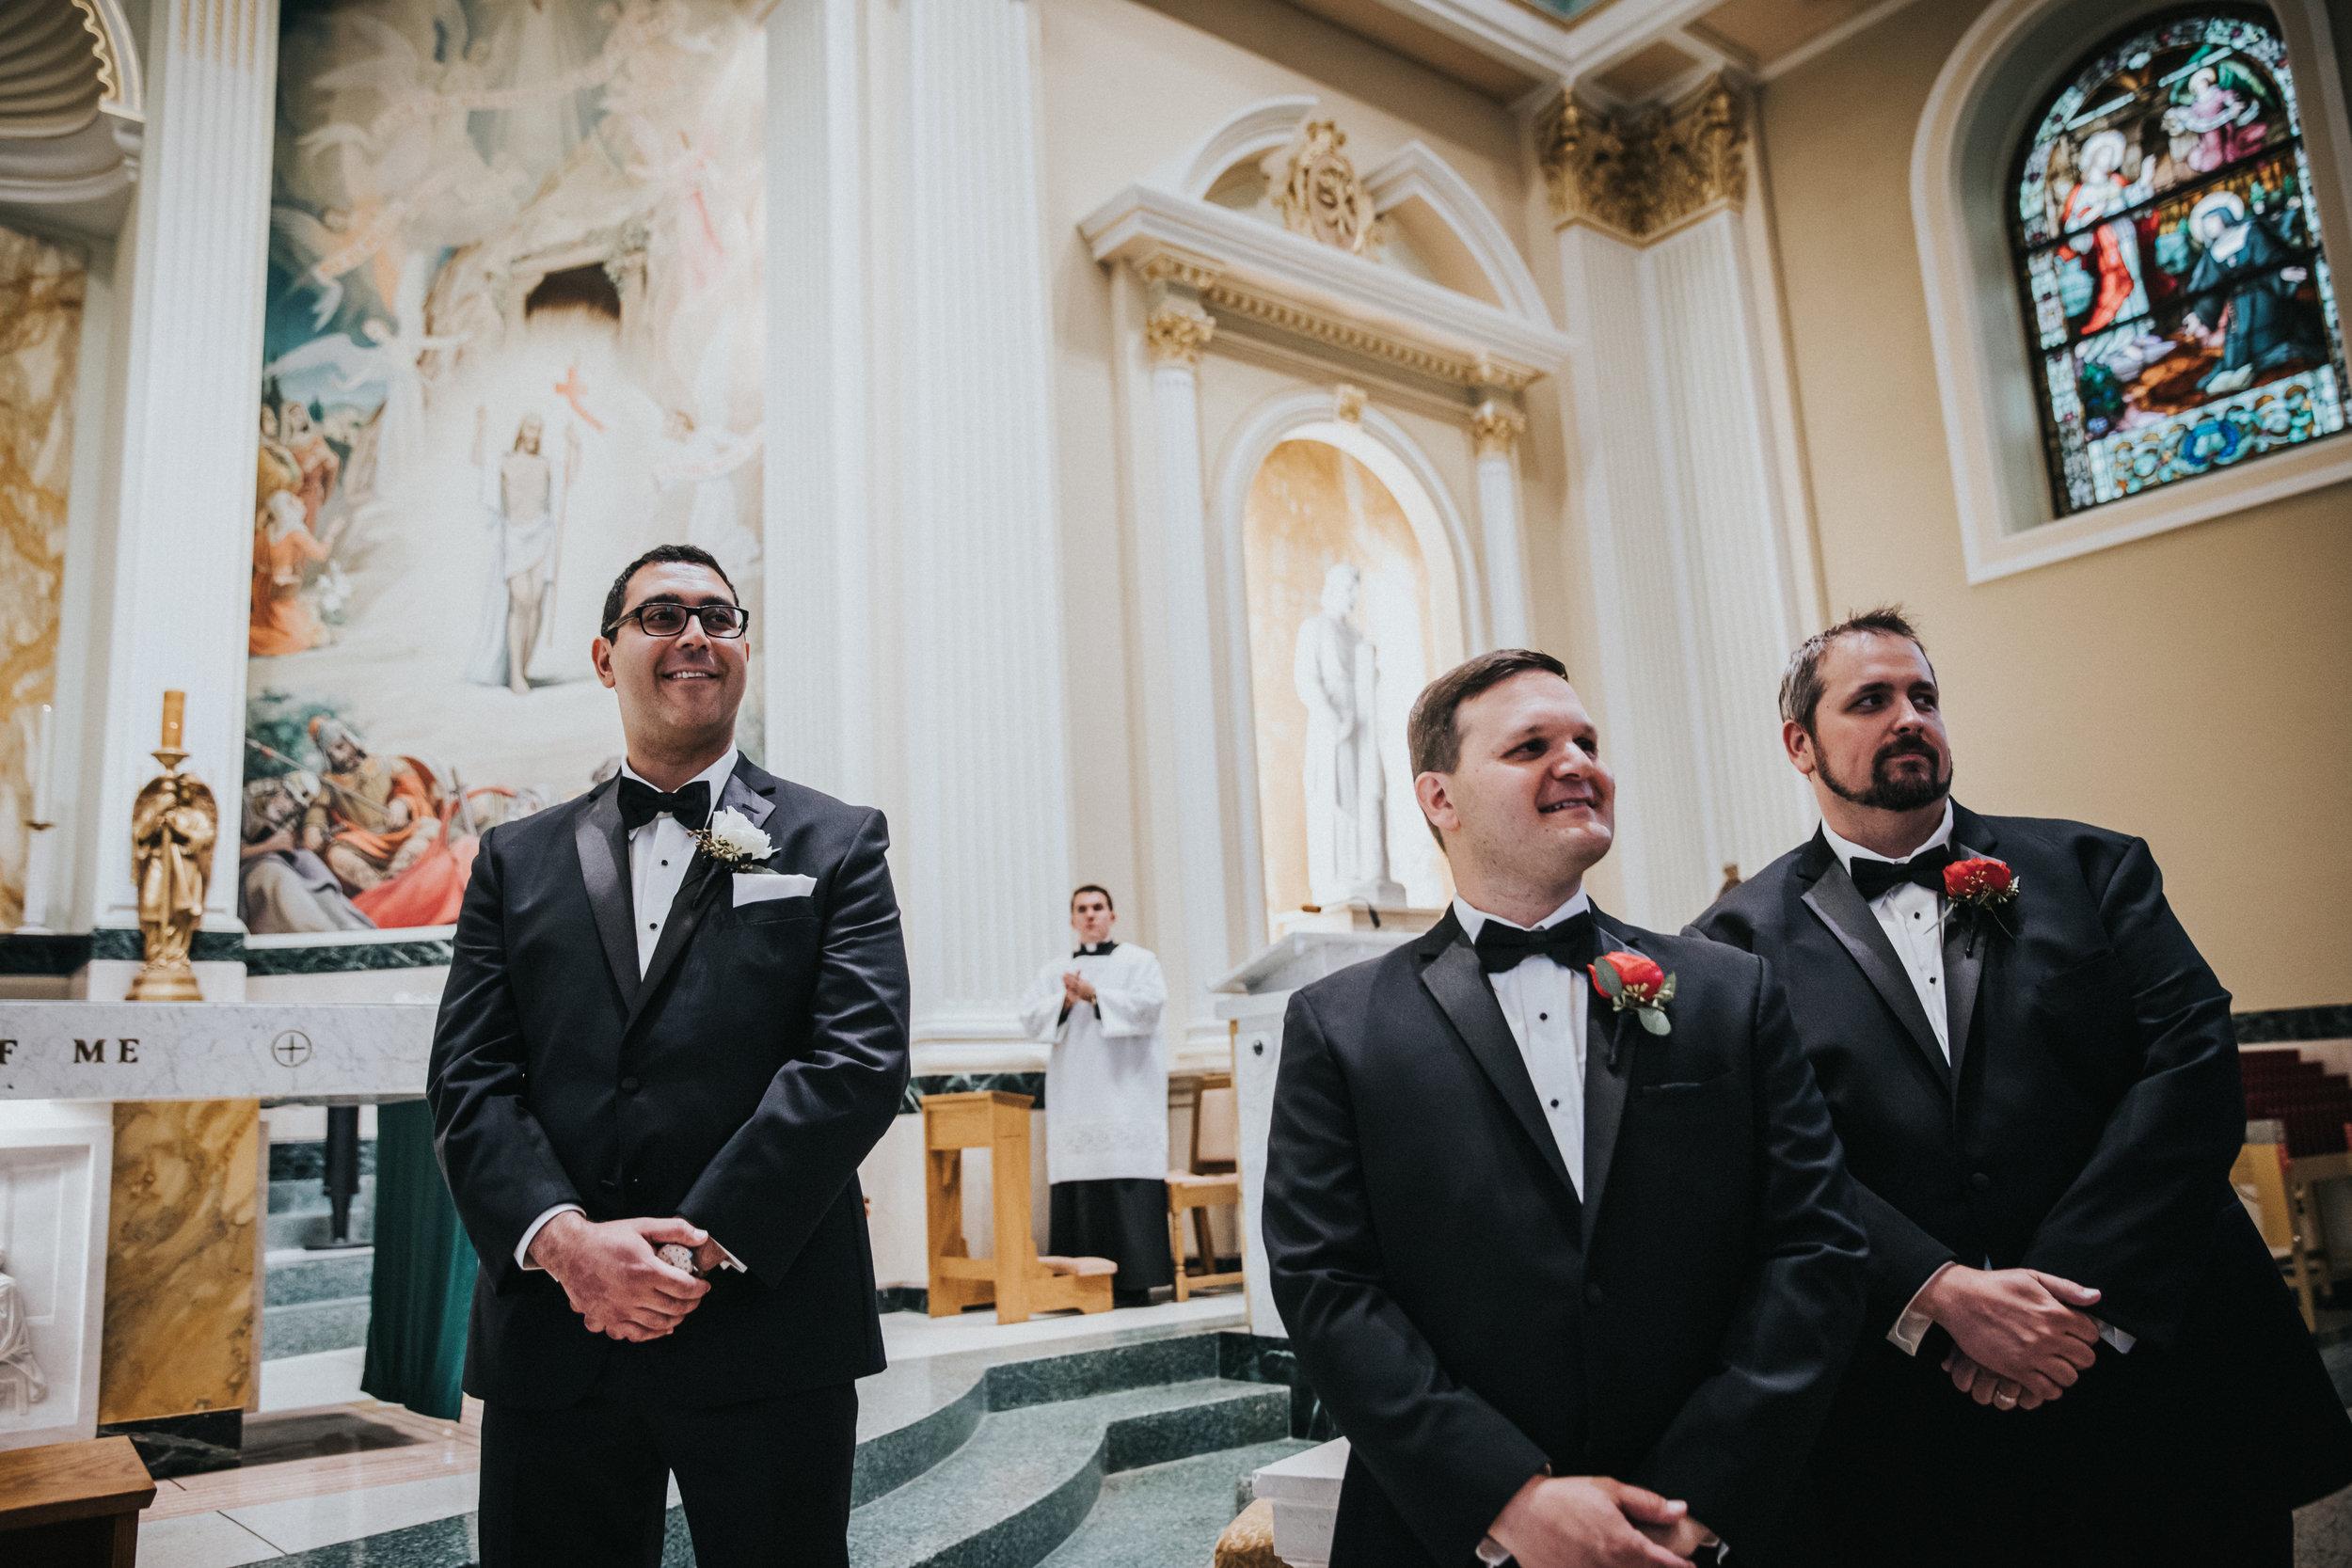 JennaLynnPhotography-NJWeddingPhotographer-Philadelphia-Wedding-ArtsBallroom-Ceremony-17.jpg